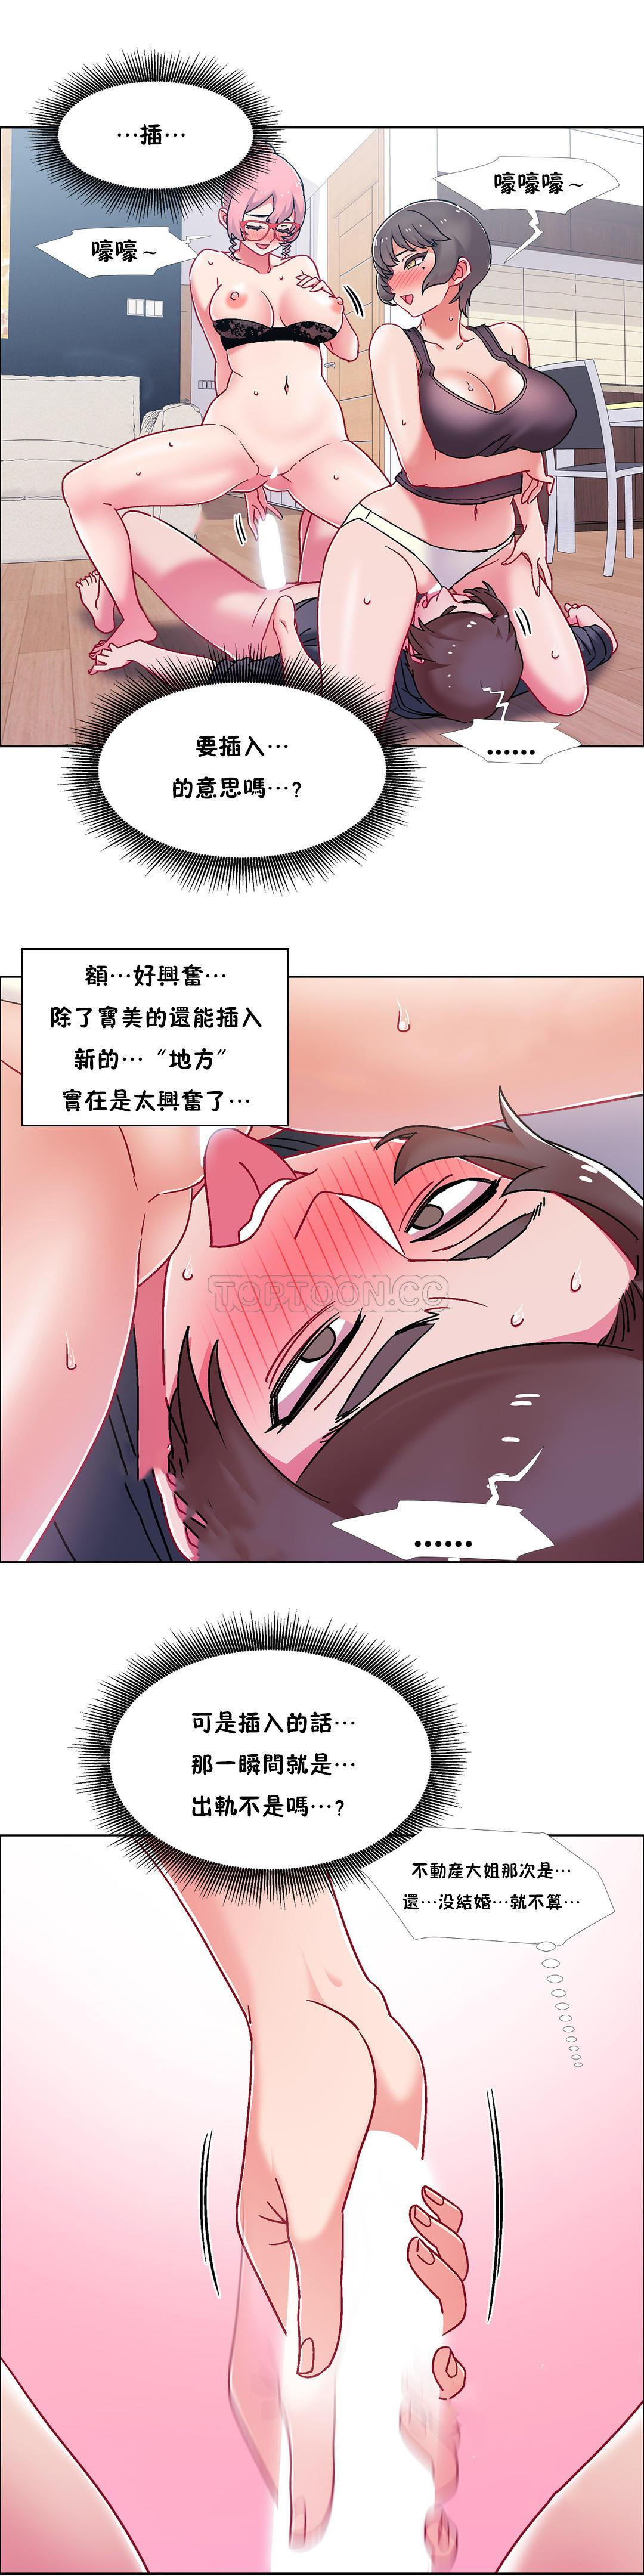 [Studio Wannabe] Rental Girls | 出租女郎 Ch. 33-58 [Chinese]  第二季 完结 381